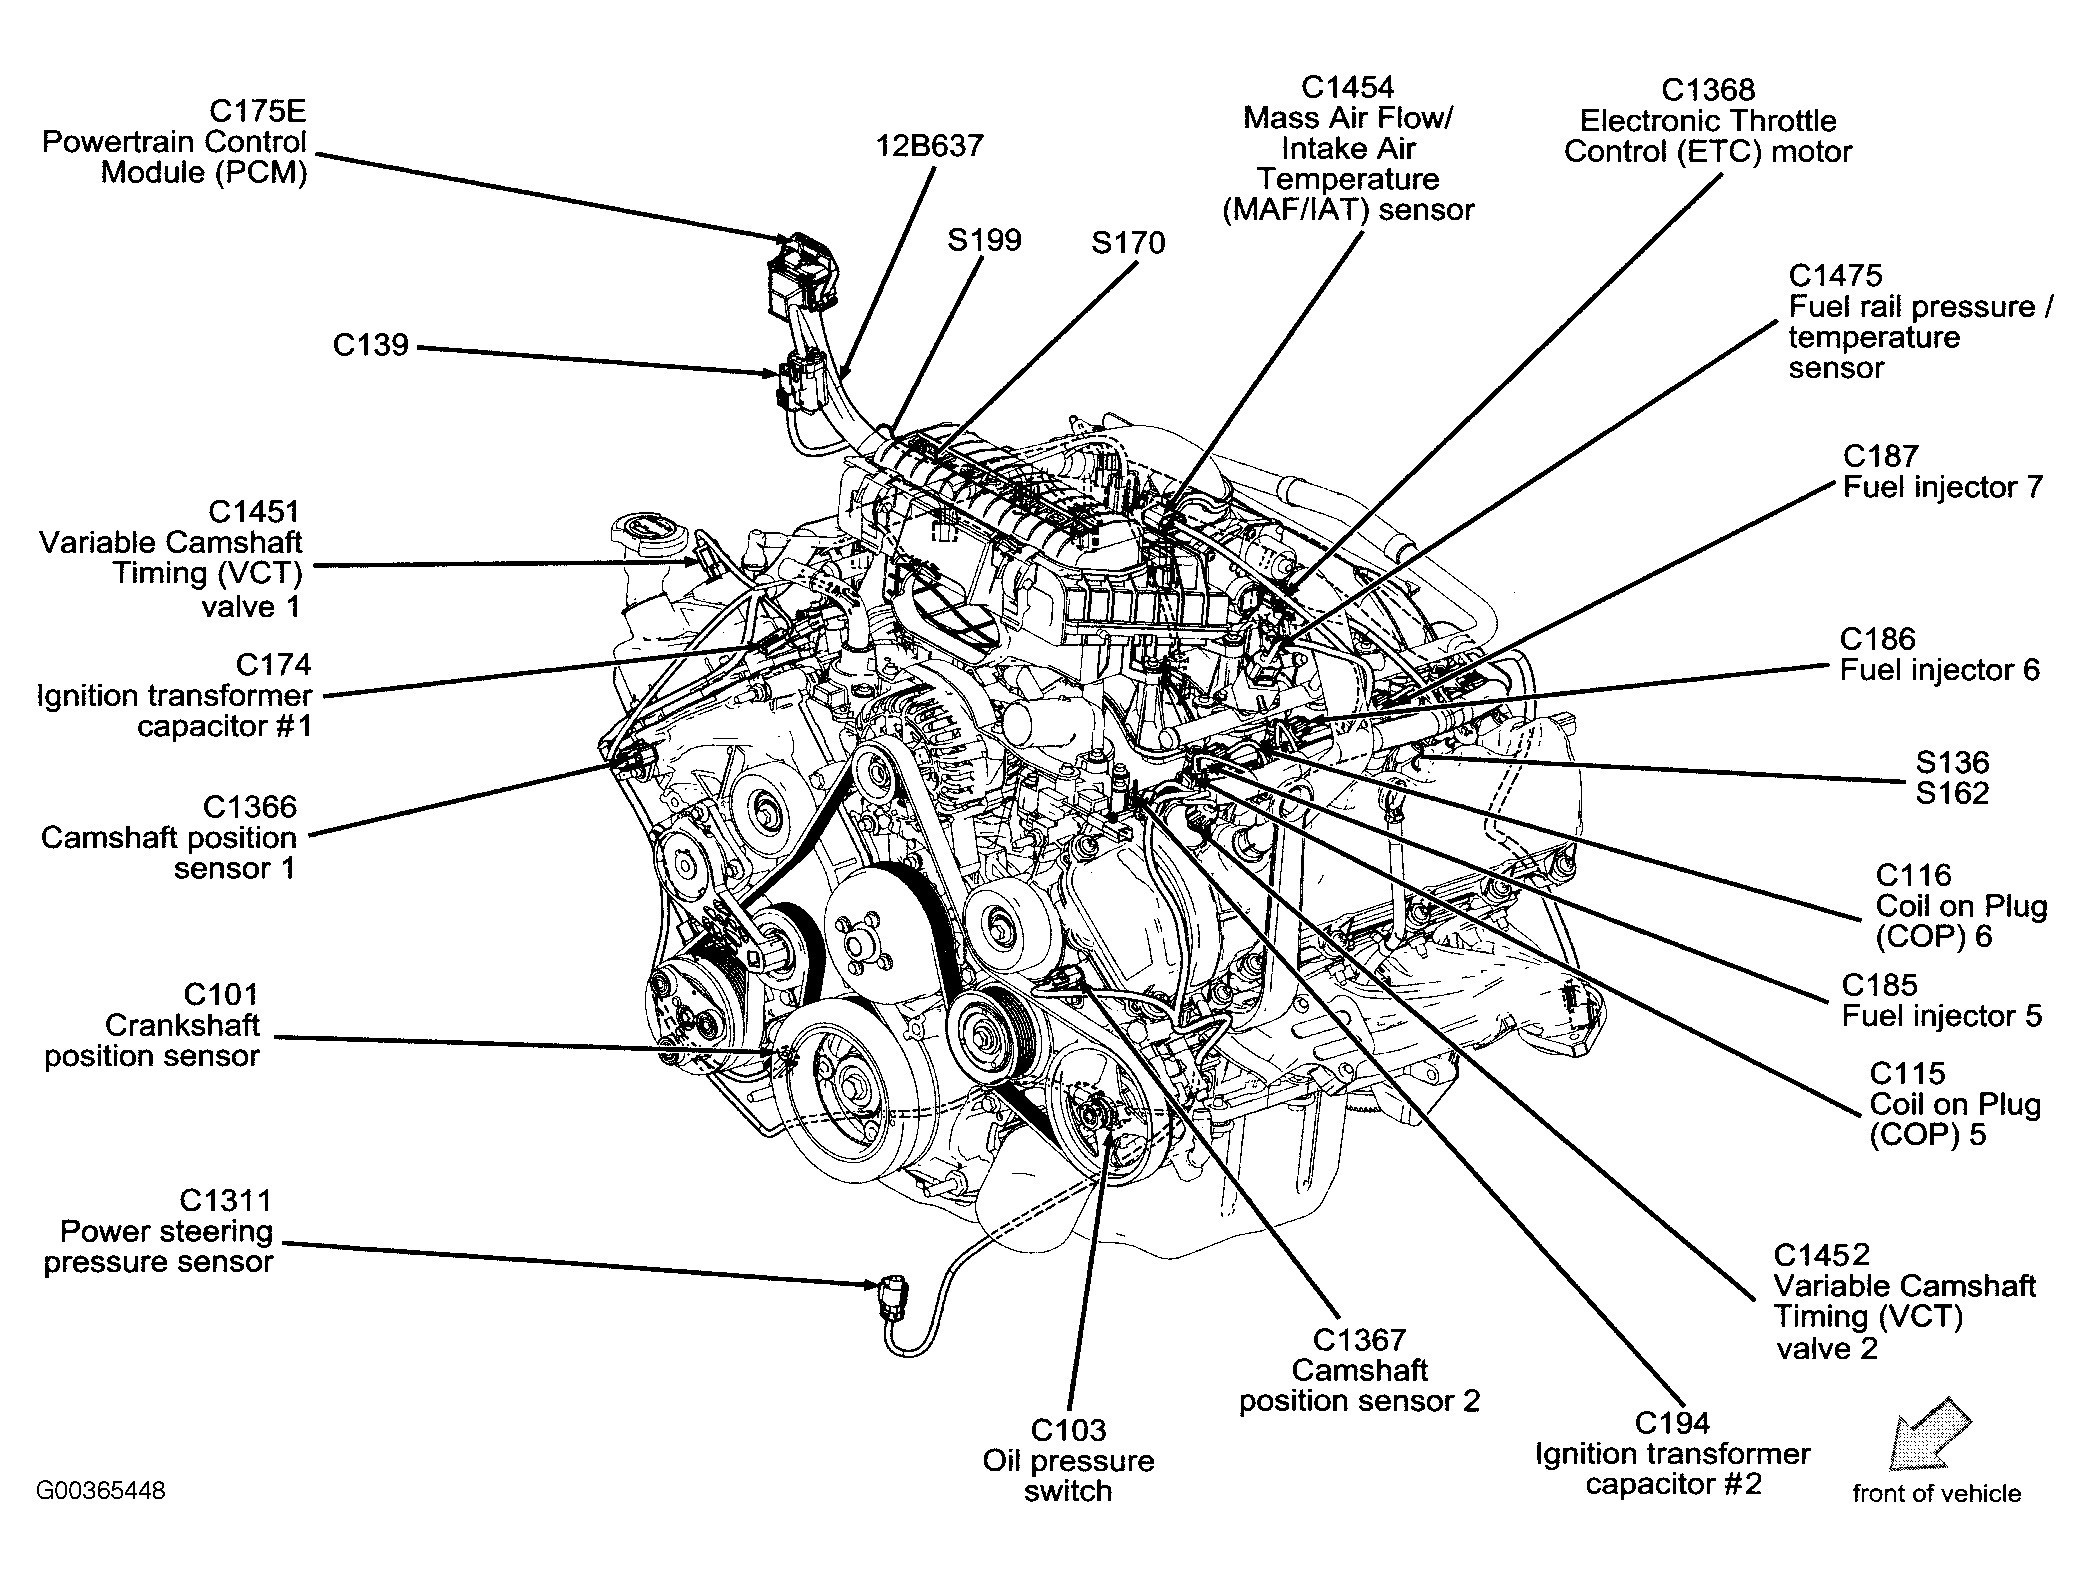 Northstar Engine Diagram north Star 4 6 Engine Diagram Of Northstar Engine Diagram Cadillac V8 Engine